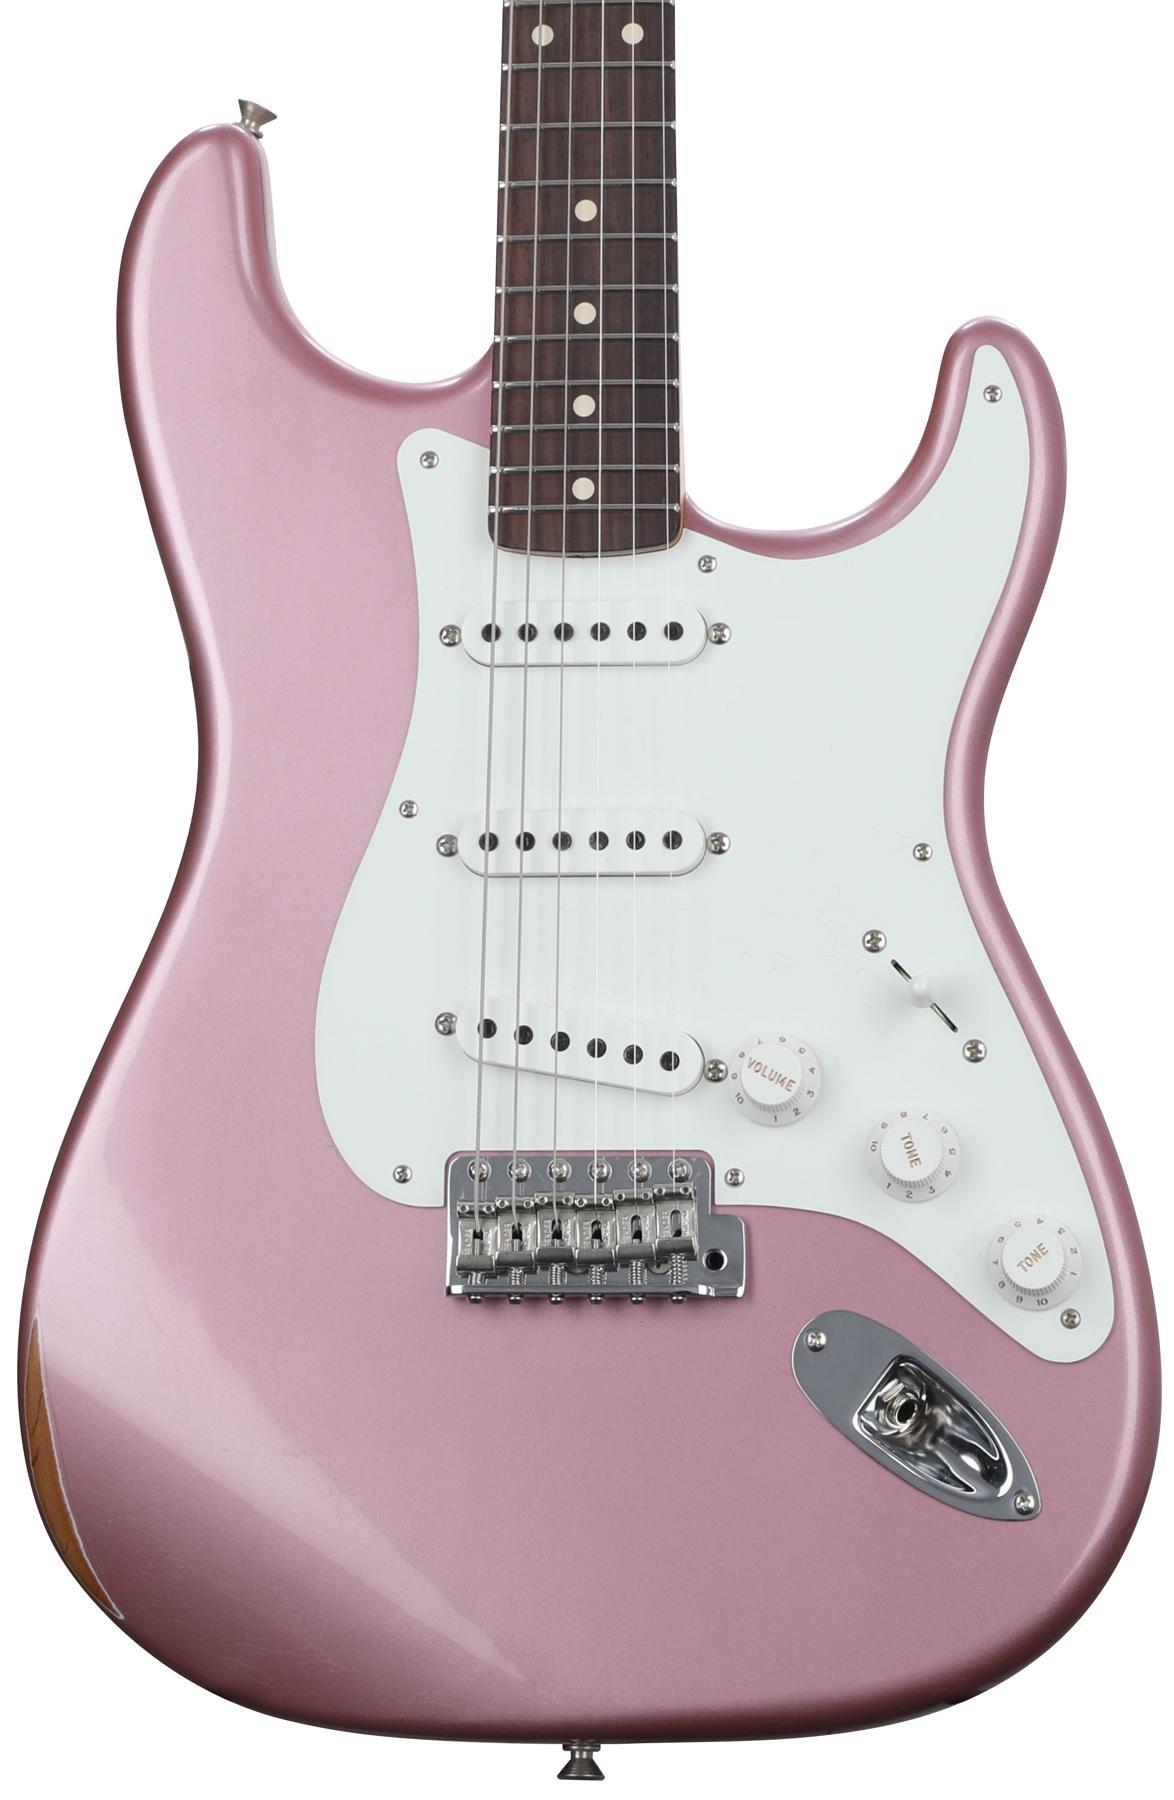 Fender Custom Shop Ancho Poblano Stratocaster Relic Burgundy Mist Guitar Kit Builder Understanding The 5way Switch Metallic Image 1